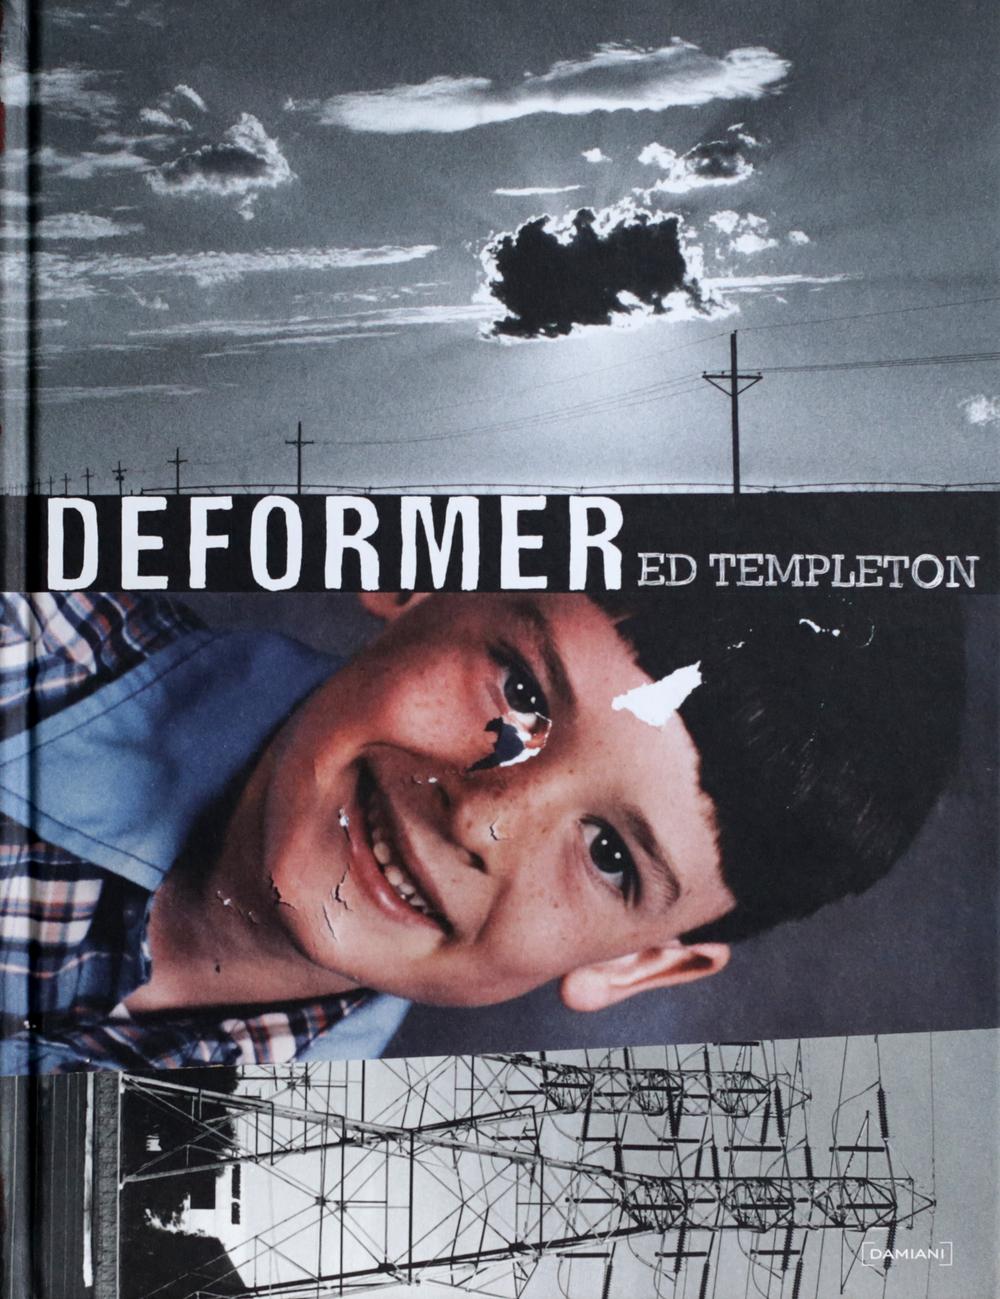 Ed Templeton- Deformer